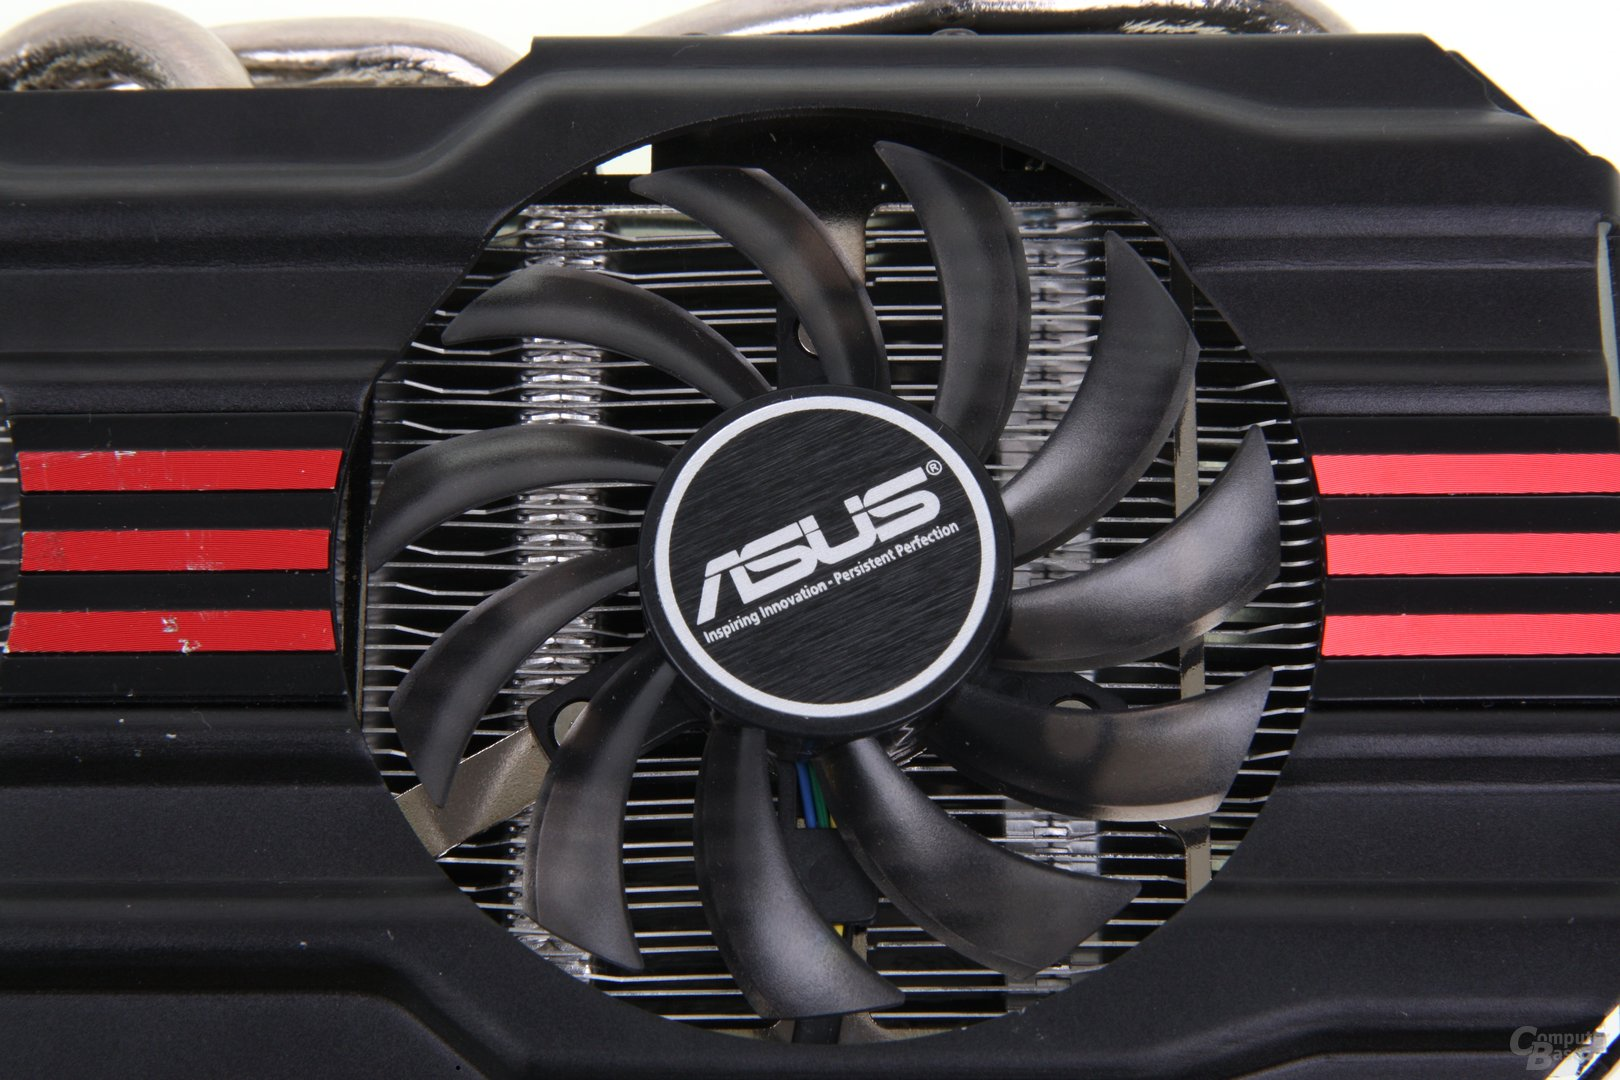 GeForce GTX 670 DCII OC Lüfter